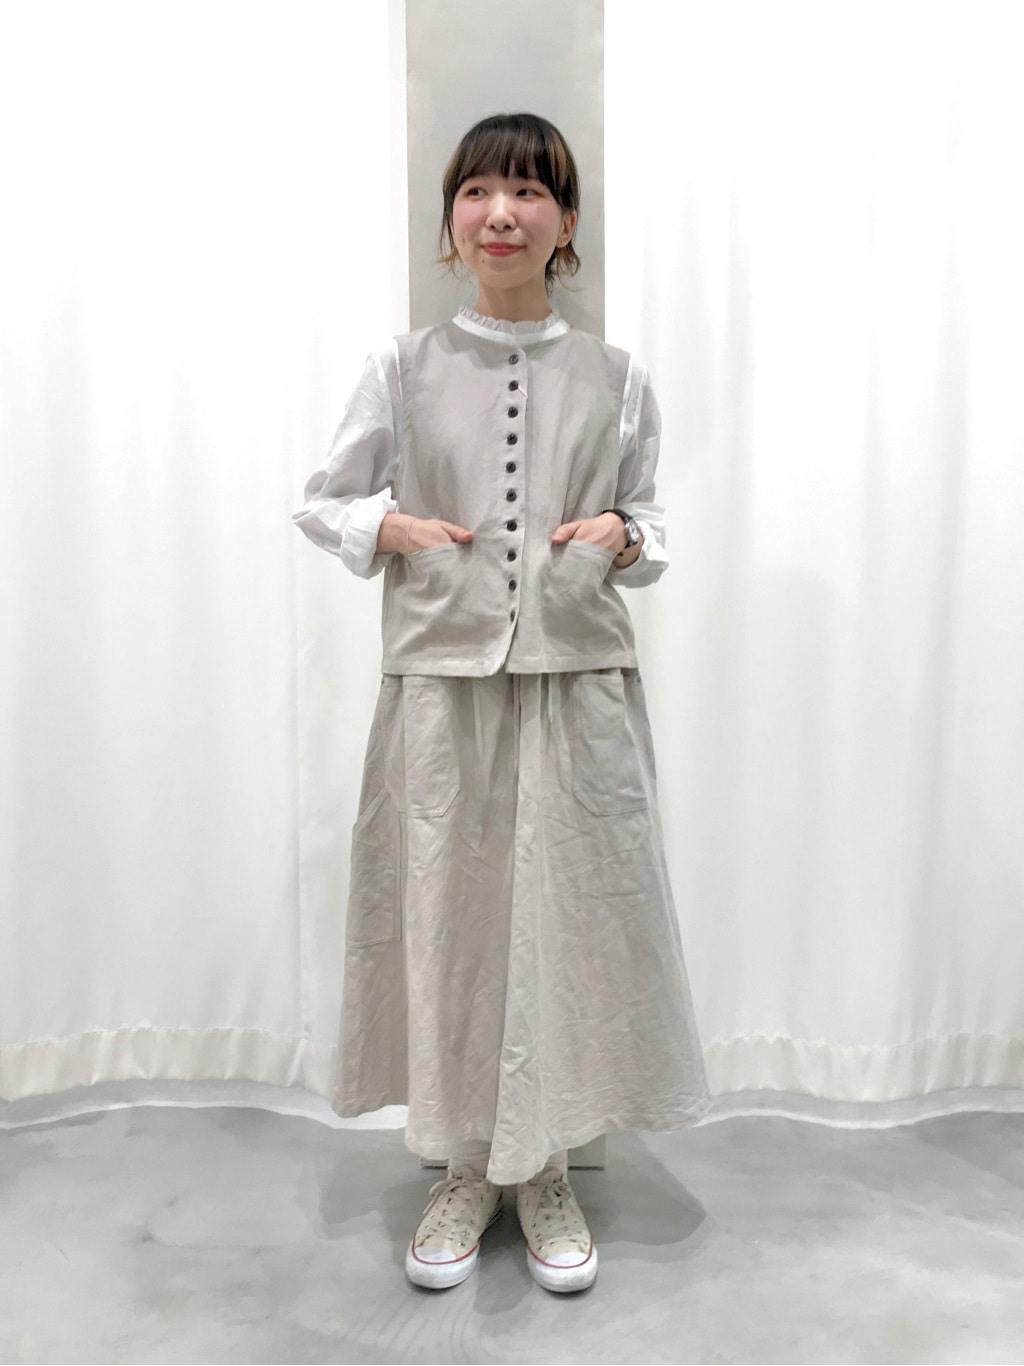 CHILD WOMAN , PAR ICI 東京スカイツリータウン・ソラマチ 2020.08.16